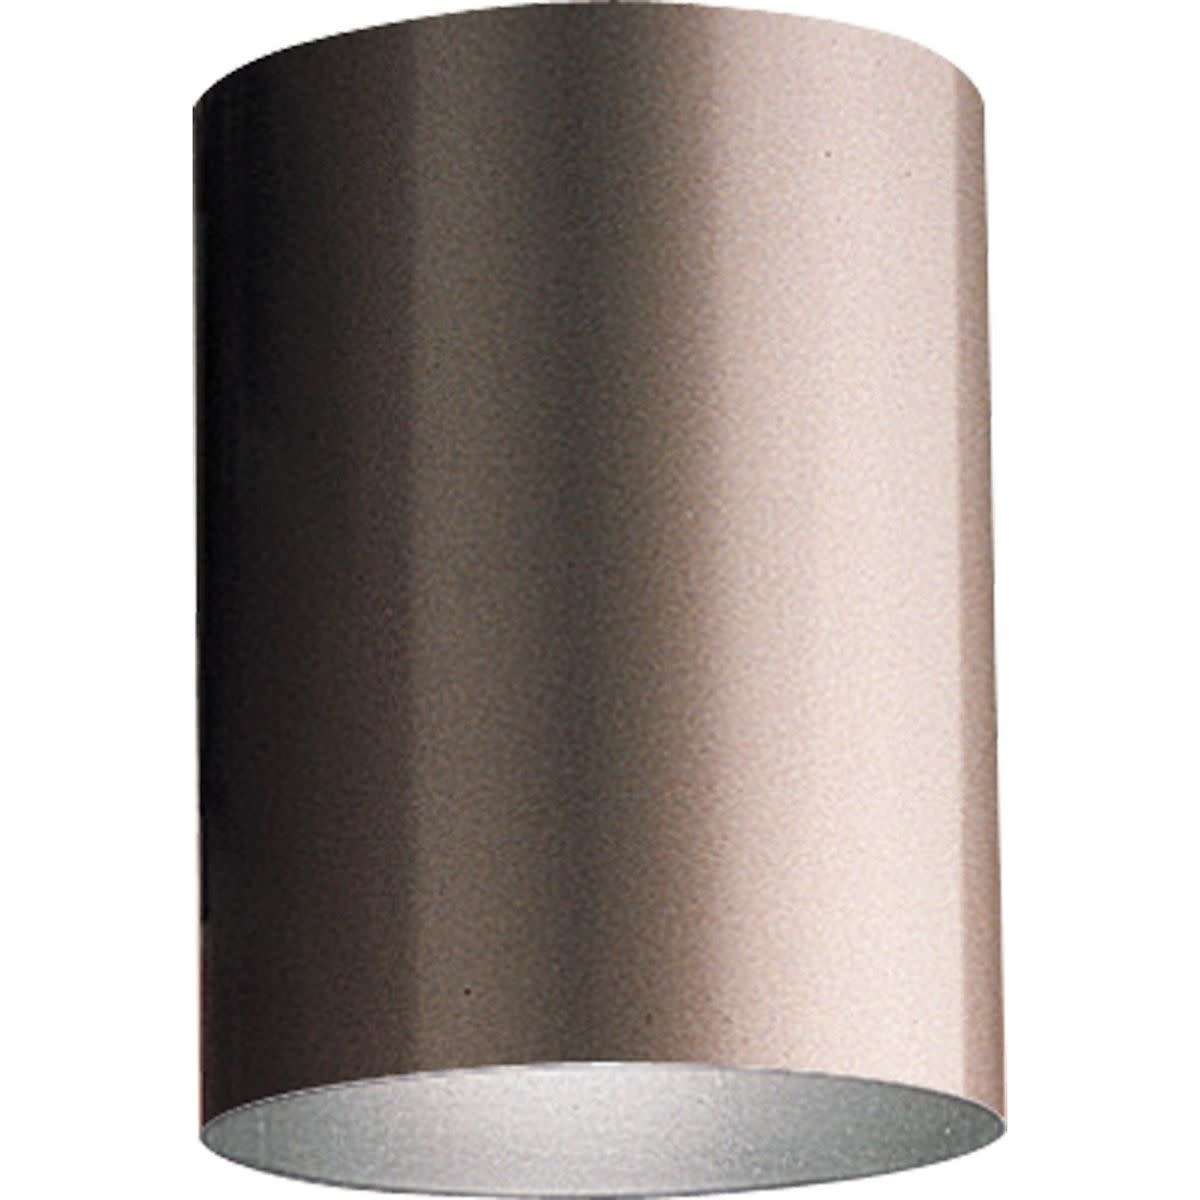 "Progress Lighting P5774 Cylinder 1 Light Flush Mount Outdoor Ceiling Fixture - 5"" Wide"